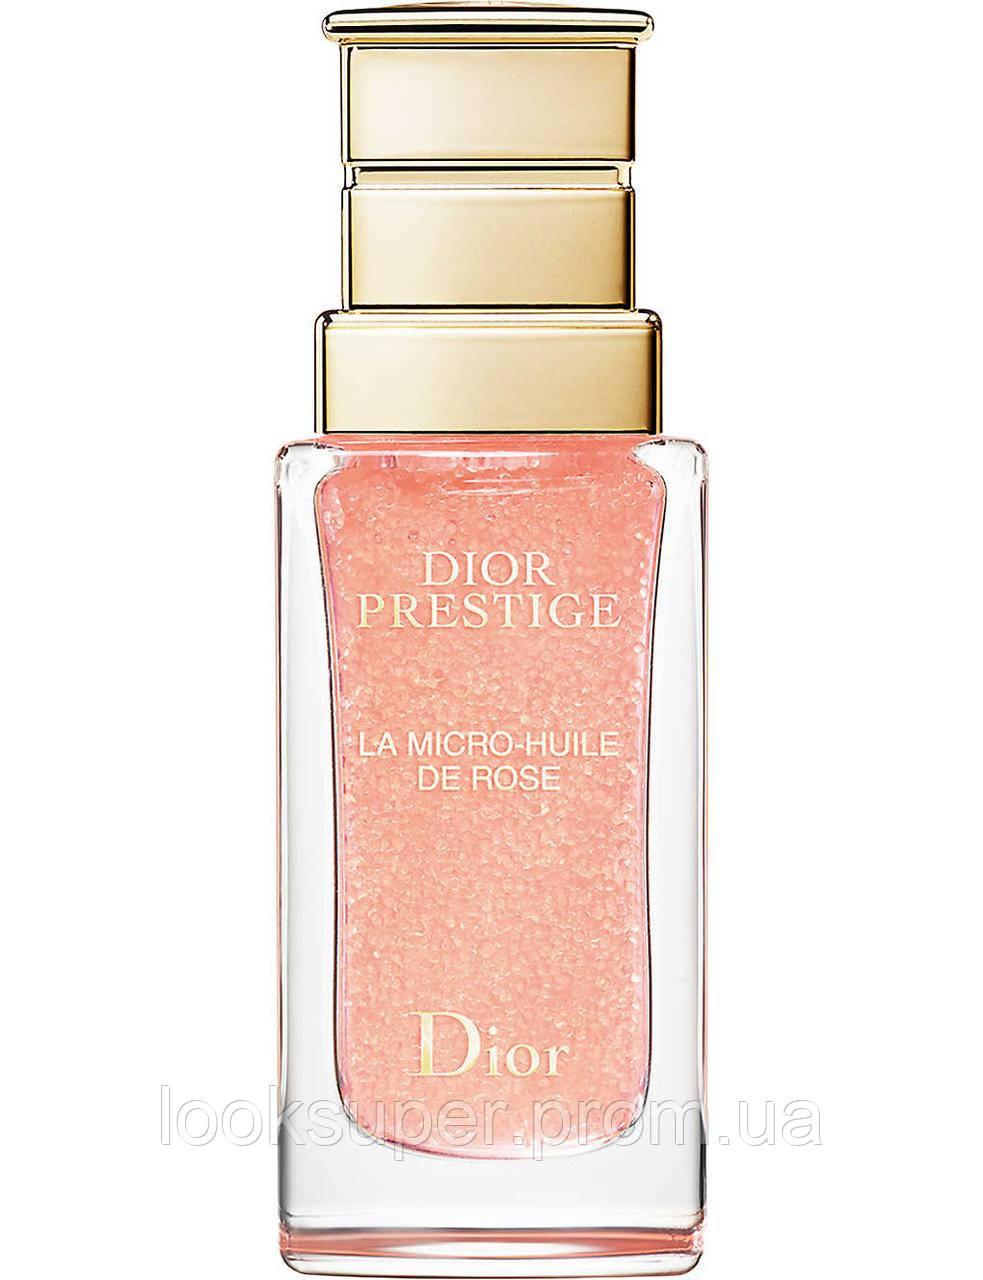 Средство для питания кожи DIOR Prestige La Micro-Huile De Rose (30ml)